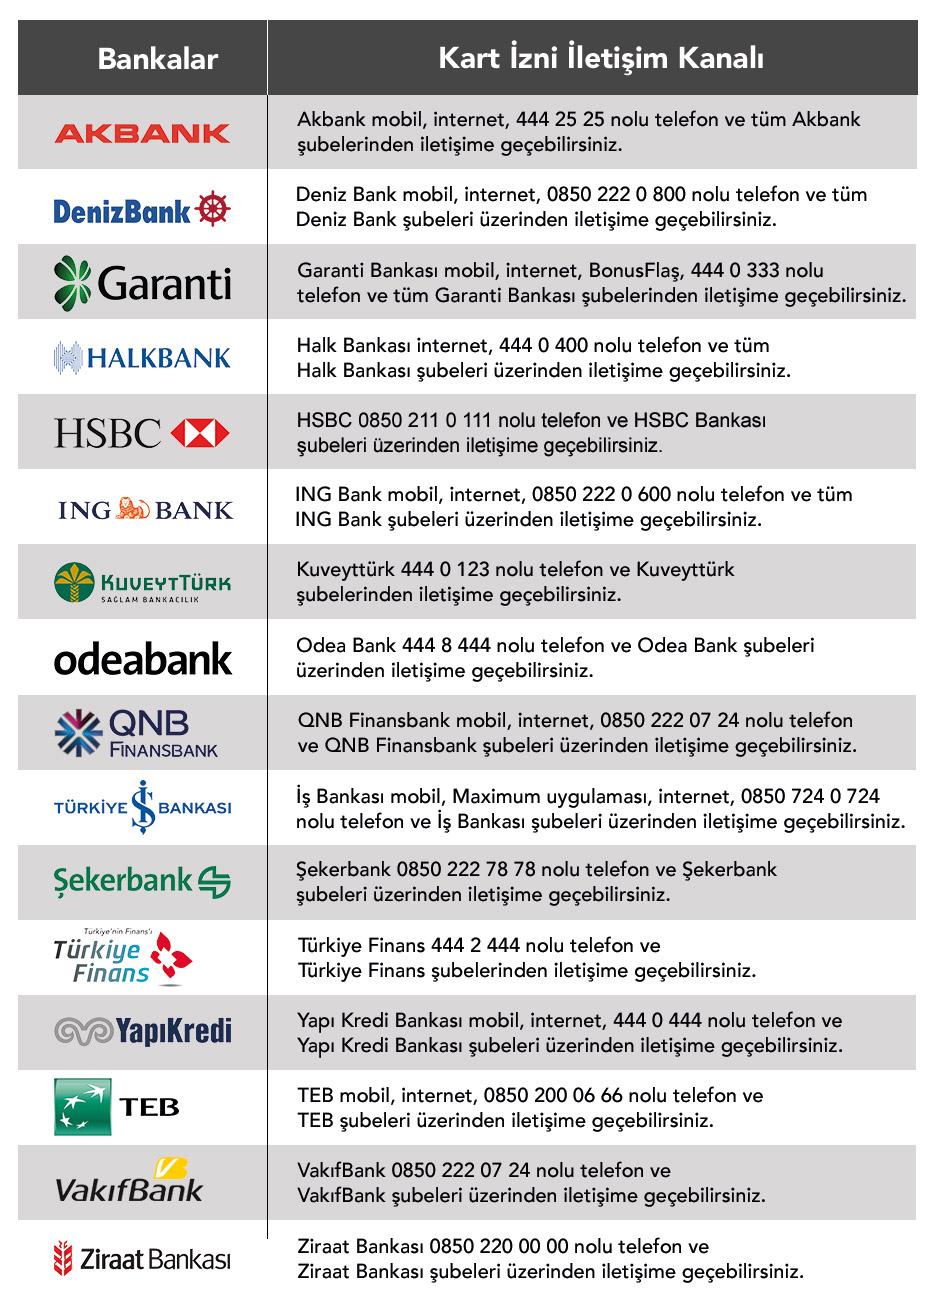 BKMexpress-bankalar-grafik